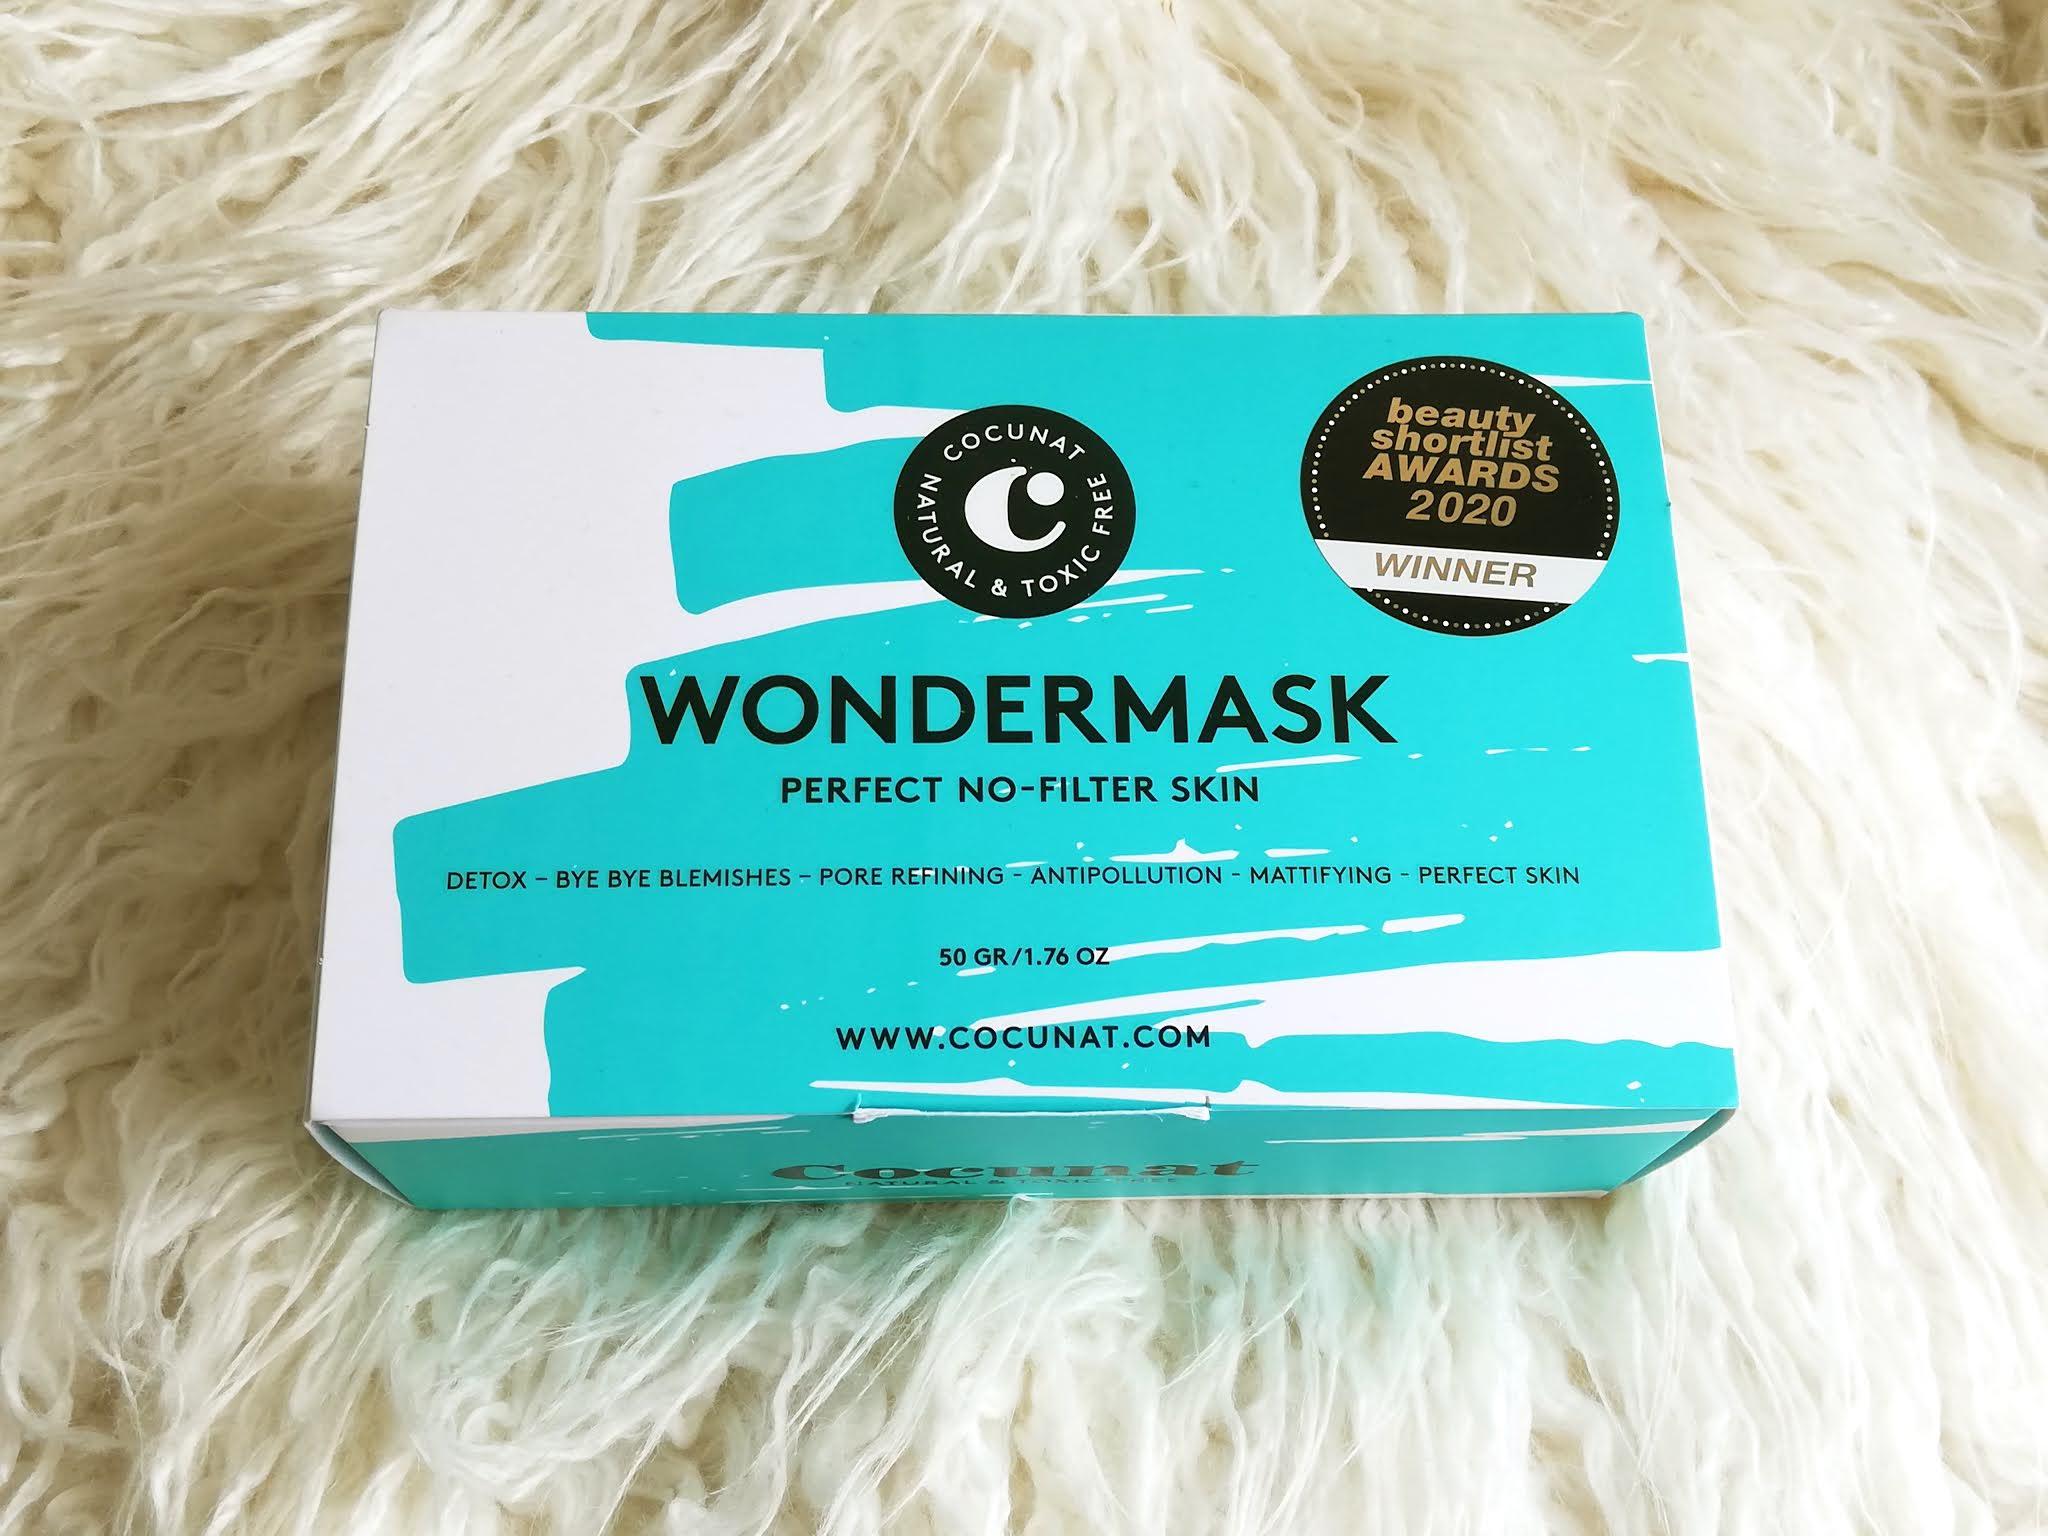 Wondermask Cocunat